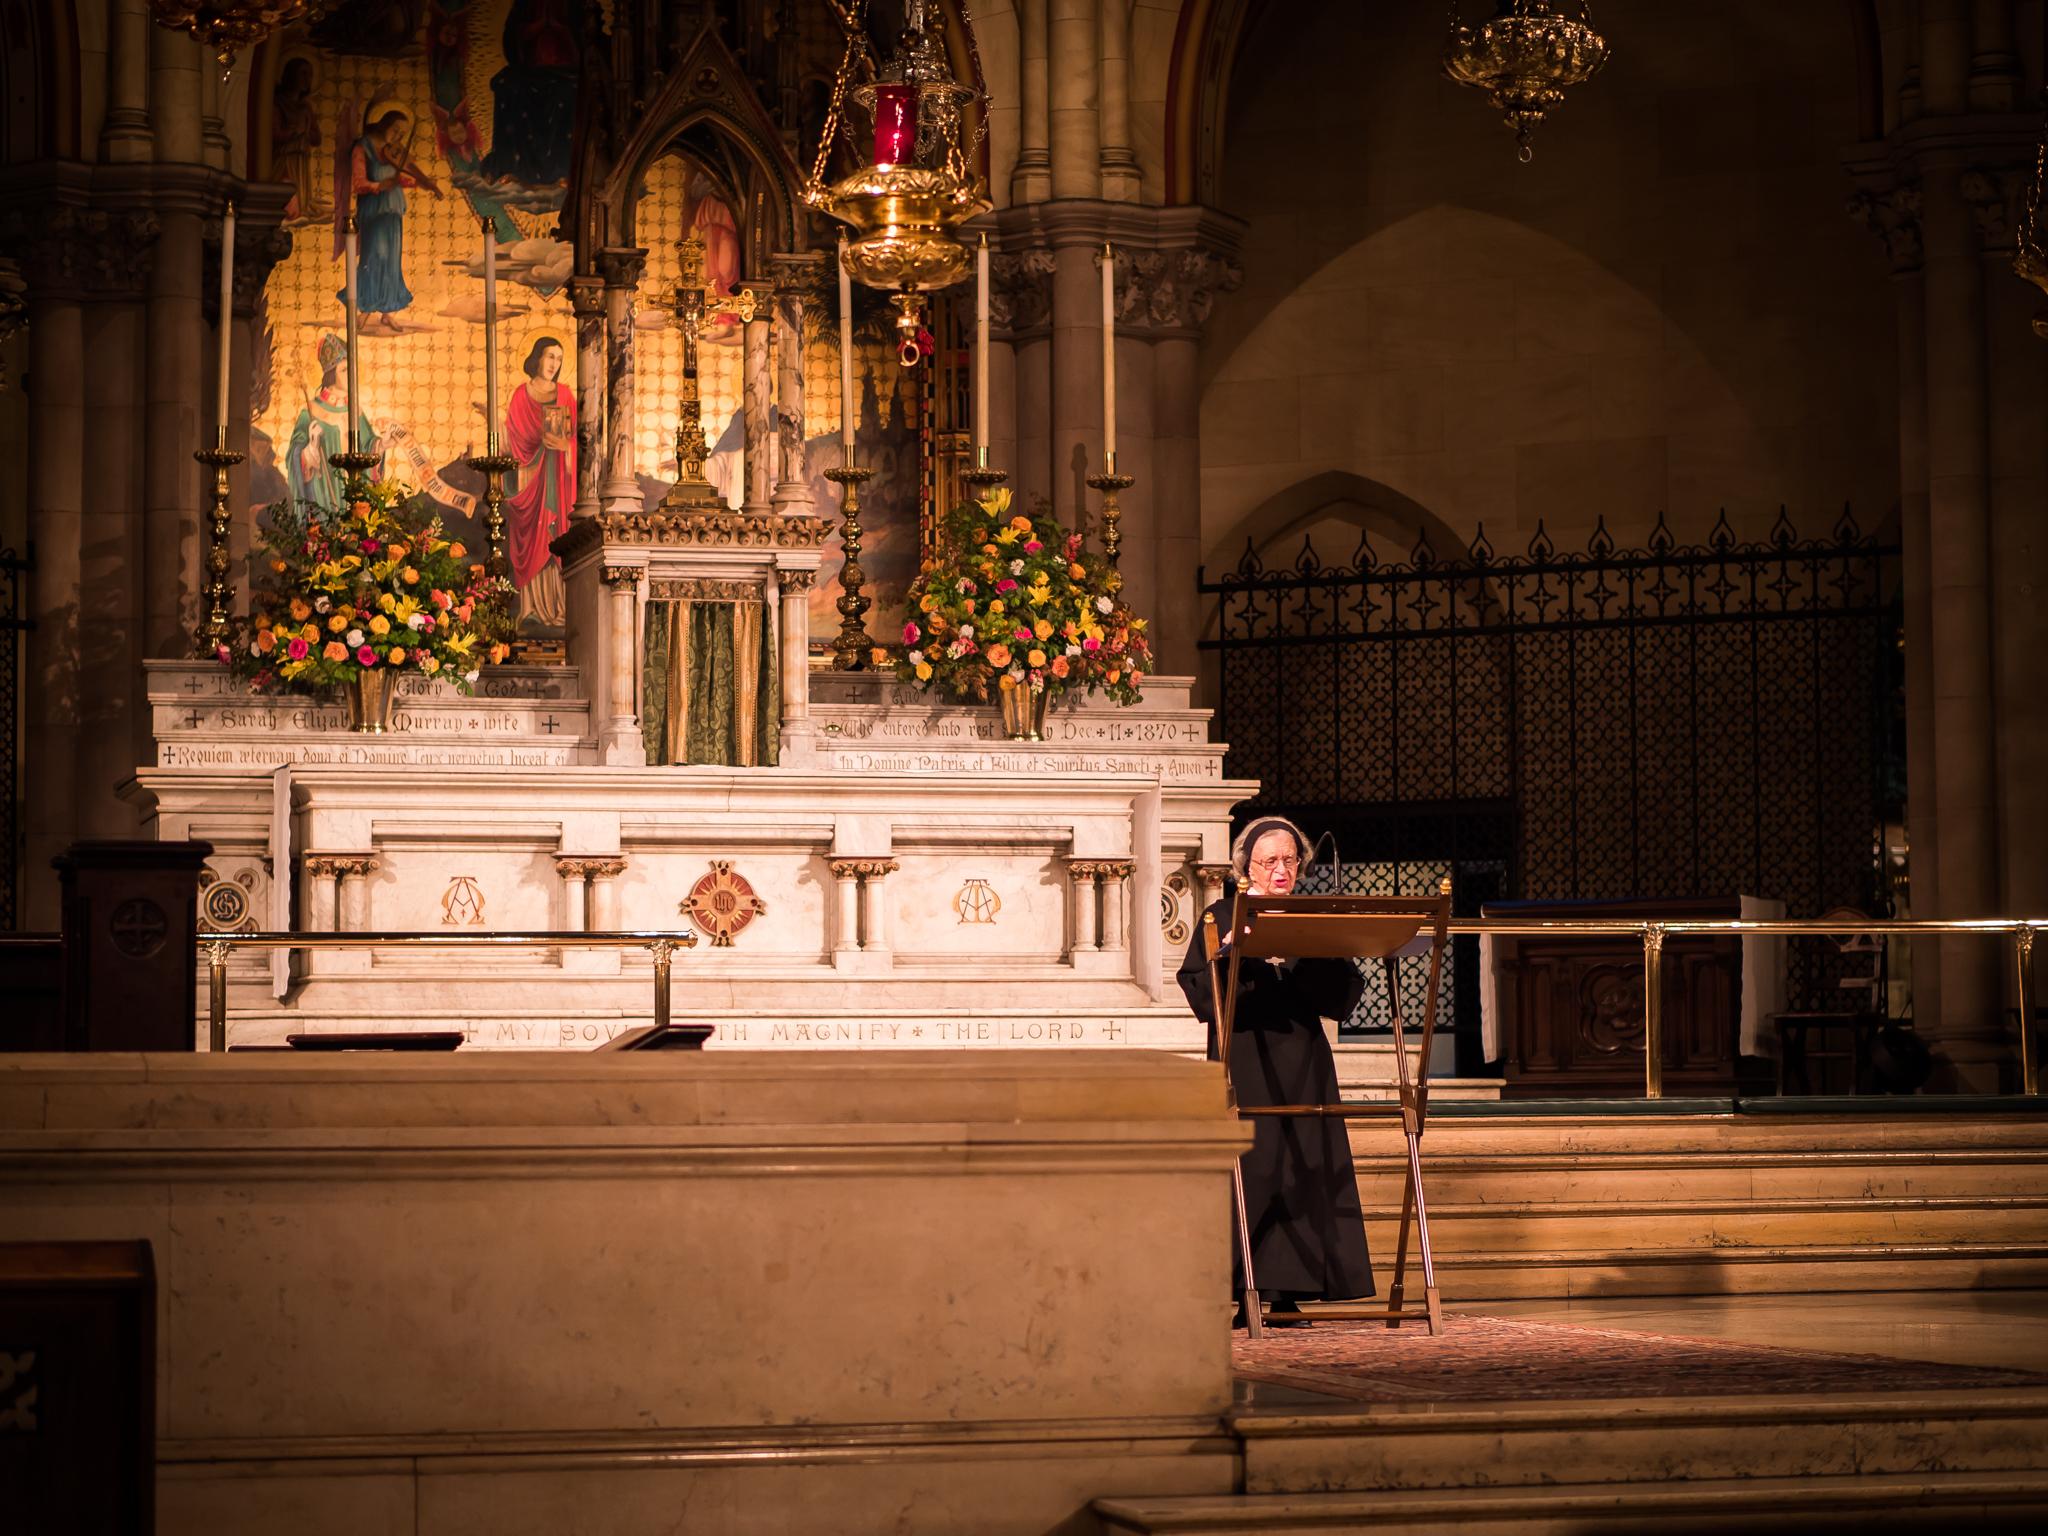 Sr. Laura Katharine, C.S.J.B., was lector at Evening Prayer on Sunday, July 22, 2018.  Photo by Ricardo Gomez